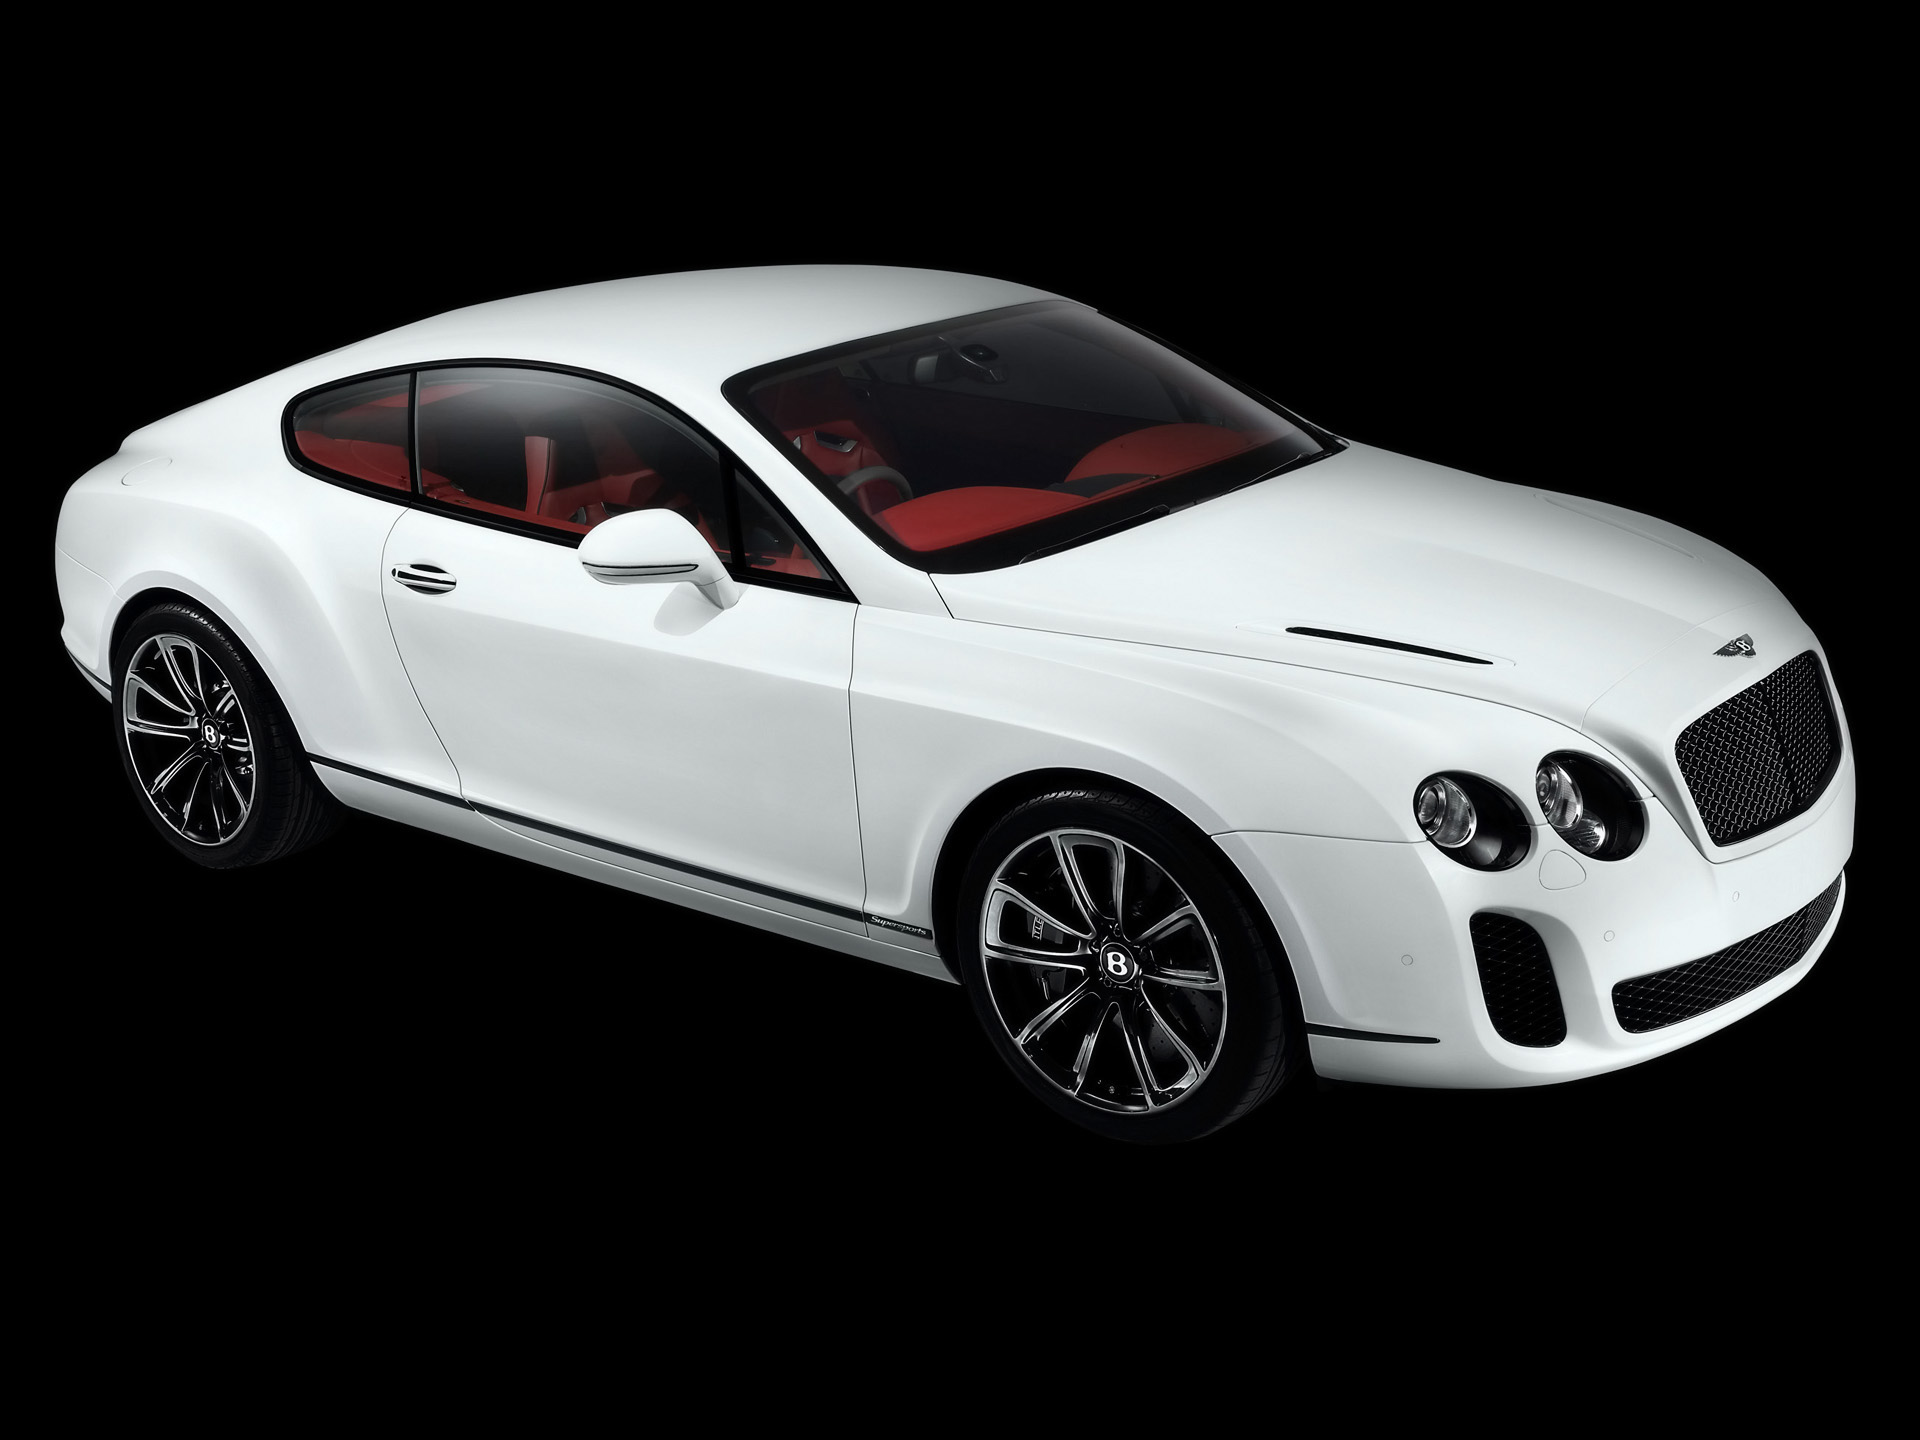 2010 Bentley Continental Supersports Desktop Wallpaper HD